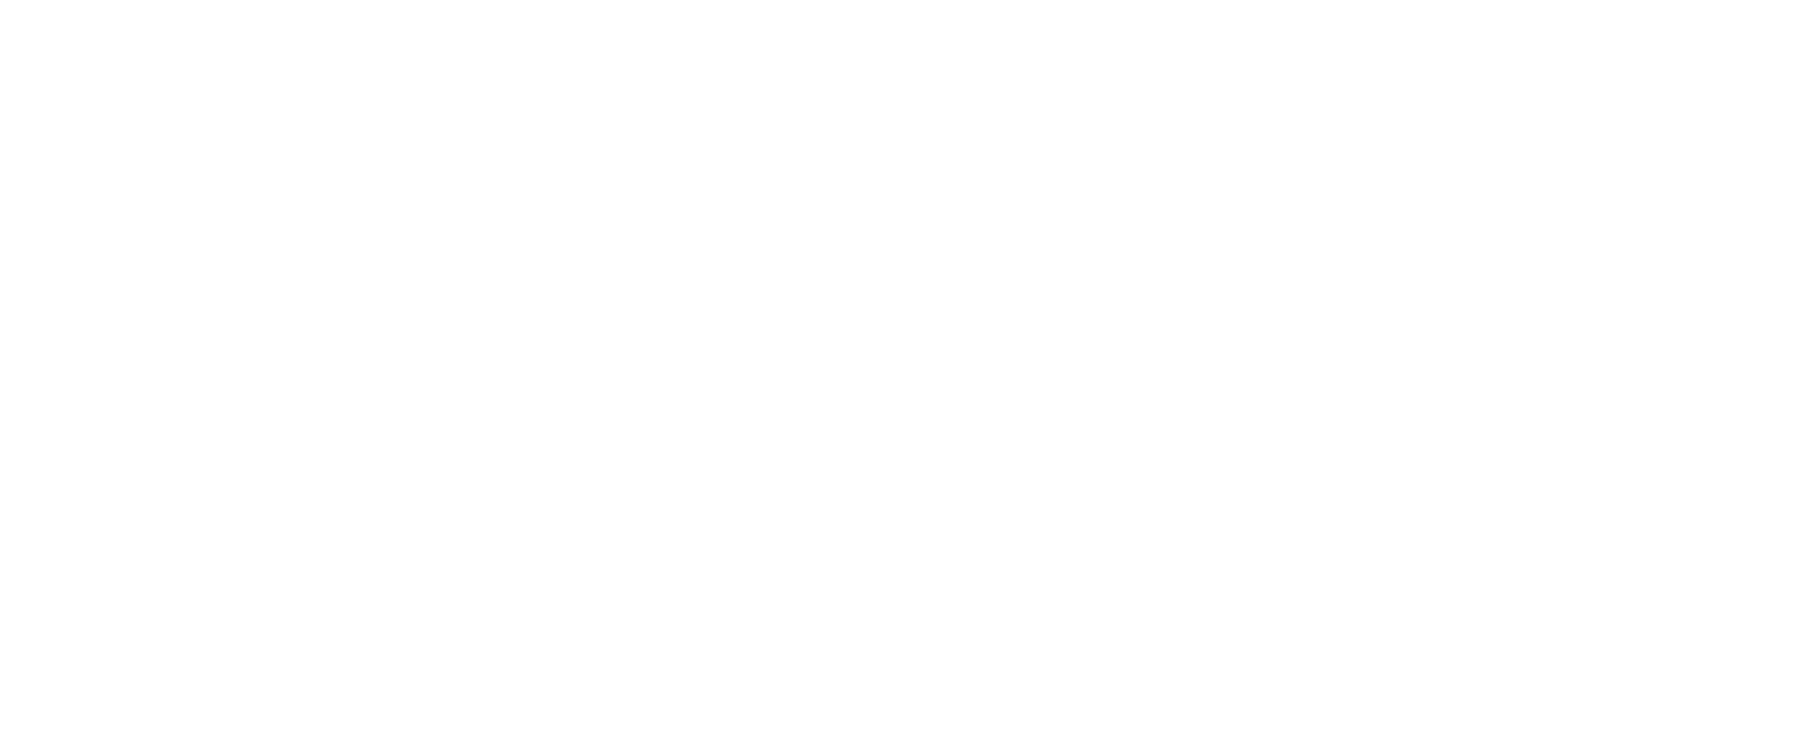 Weatherization logo white